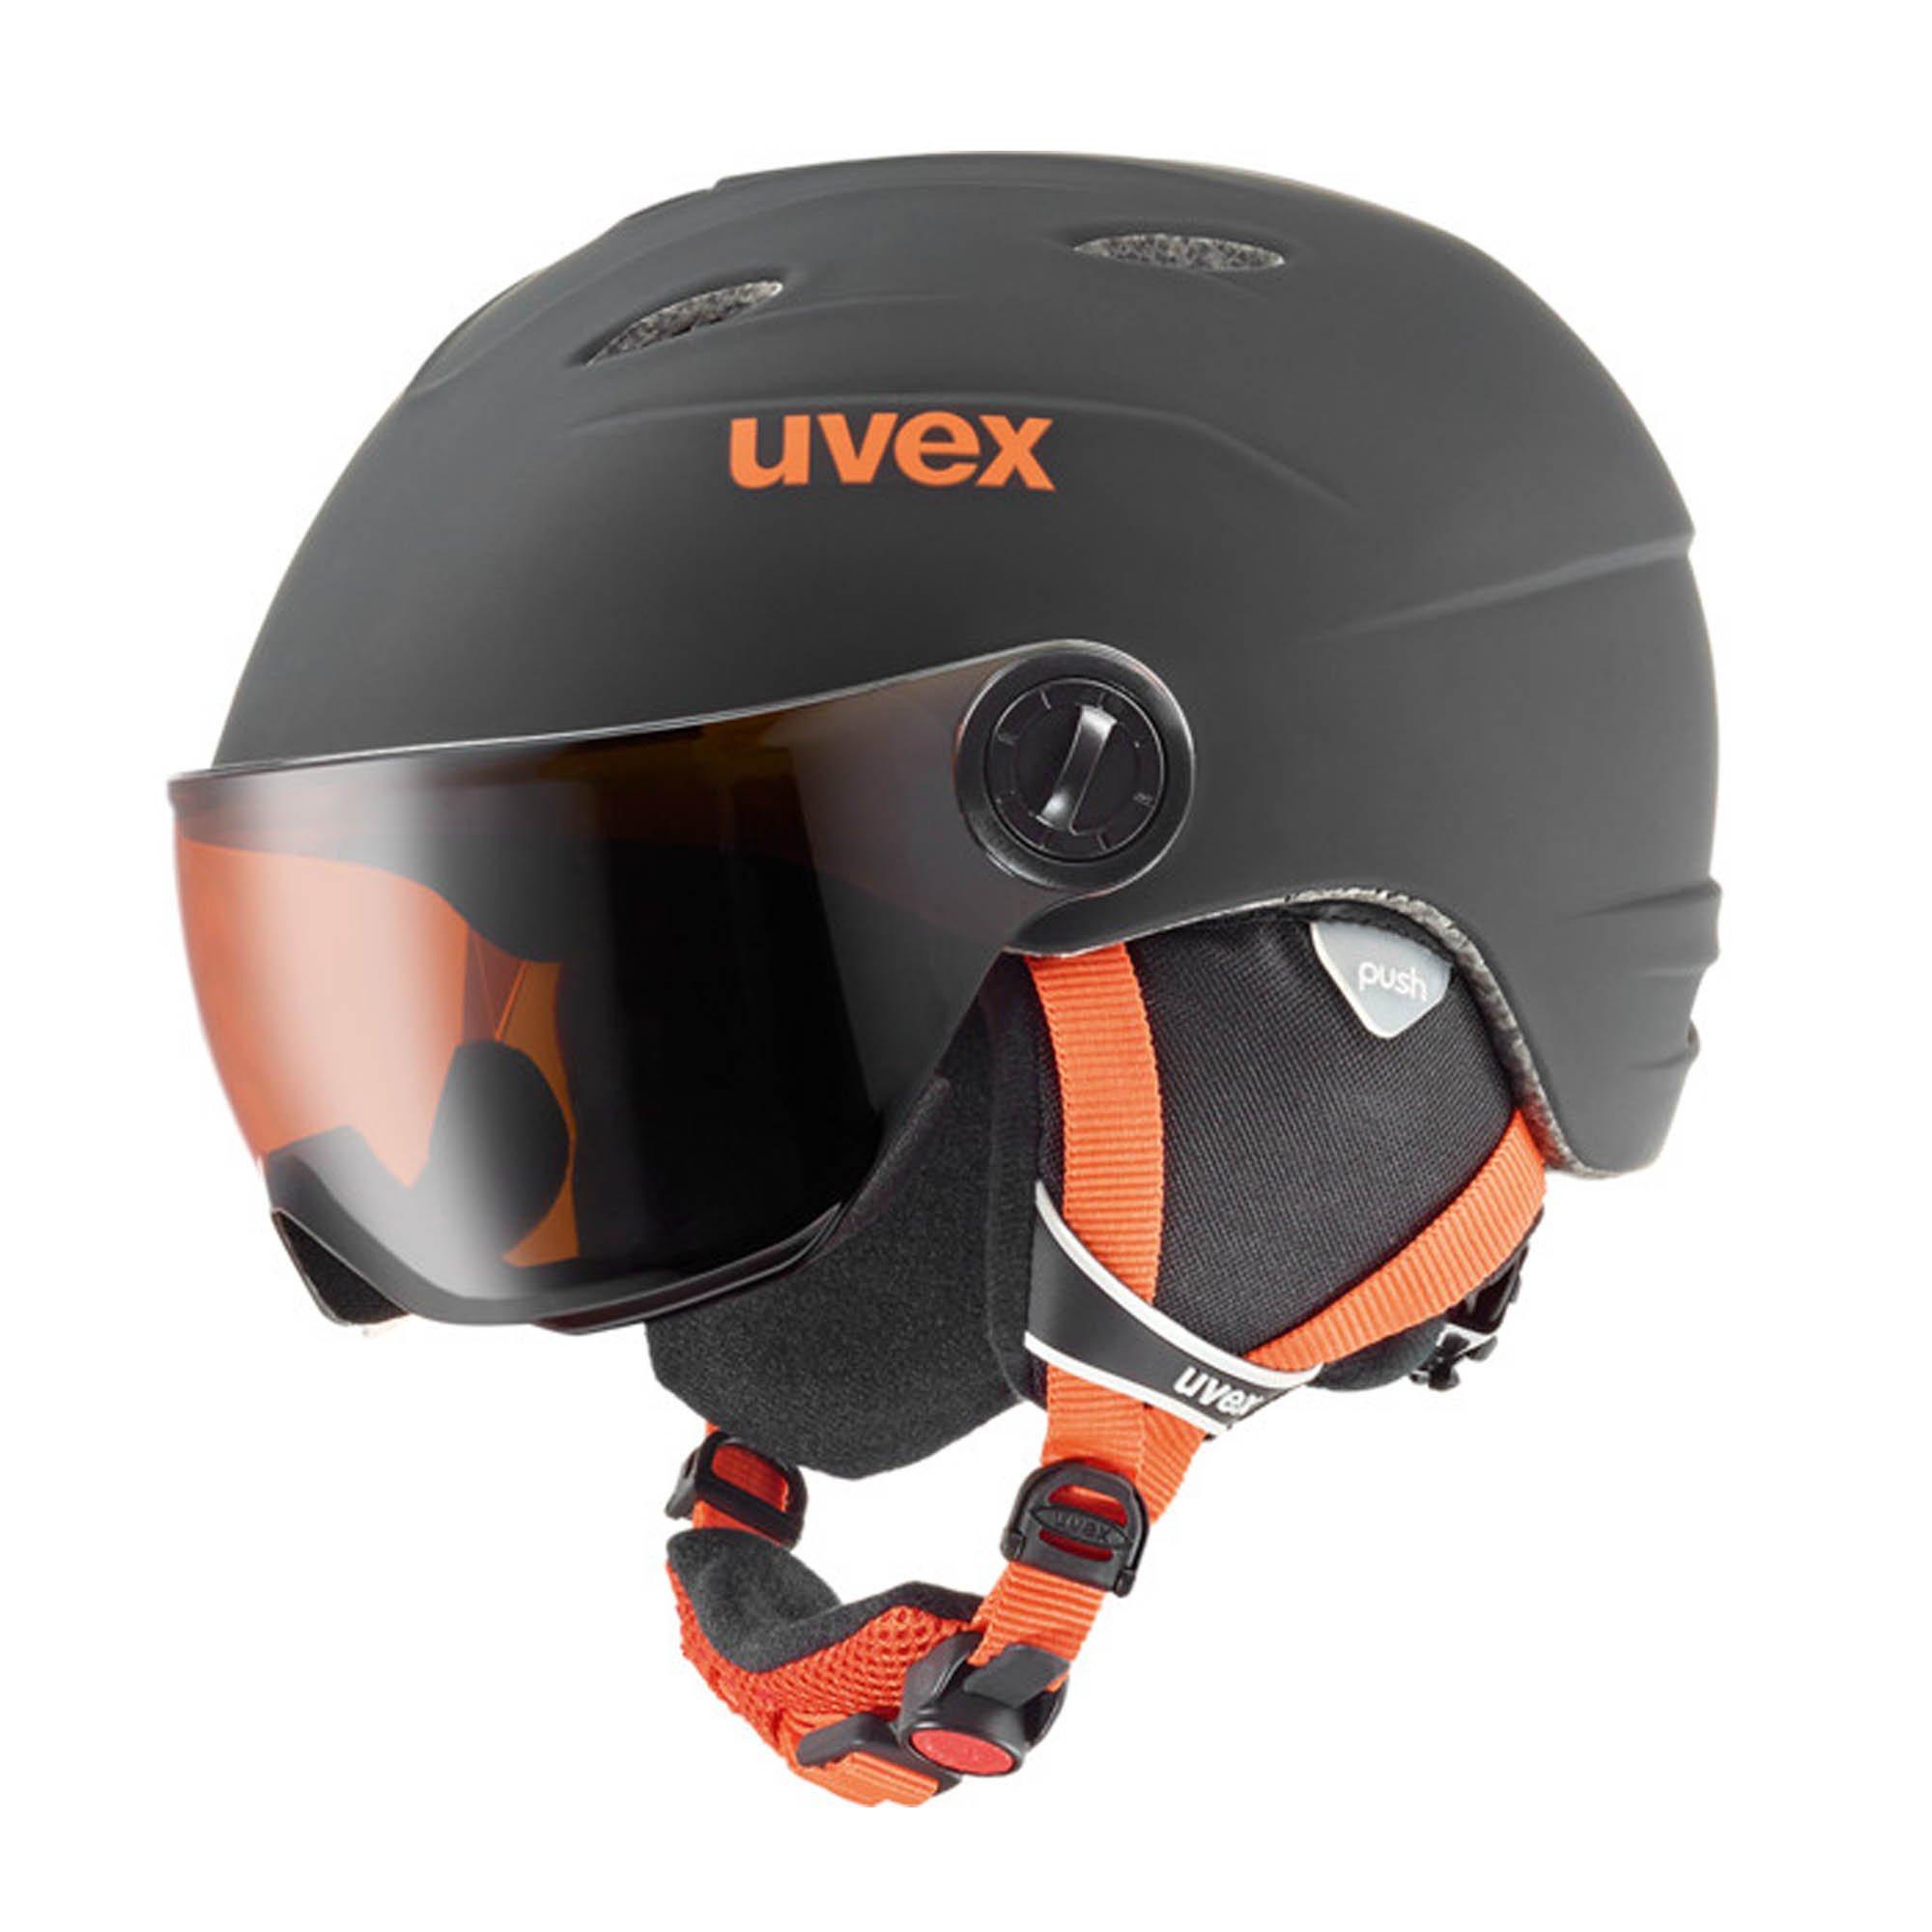 Uvex Visor Pro Jr Bl-Orange Mat 16/17